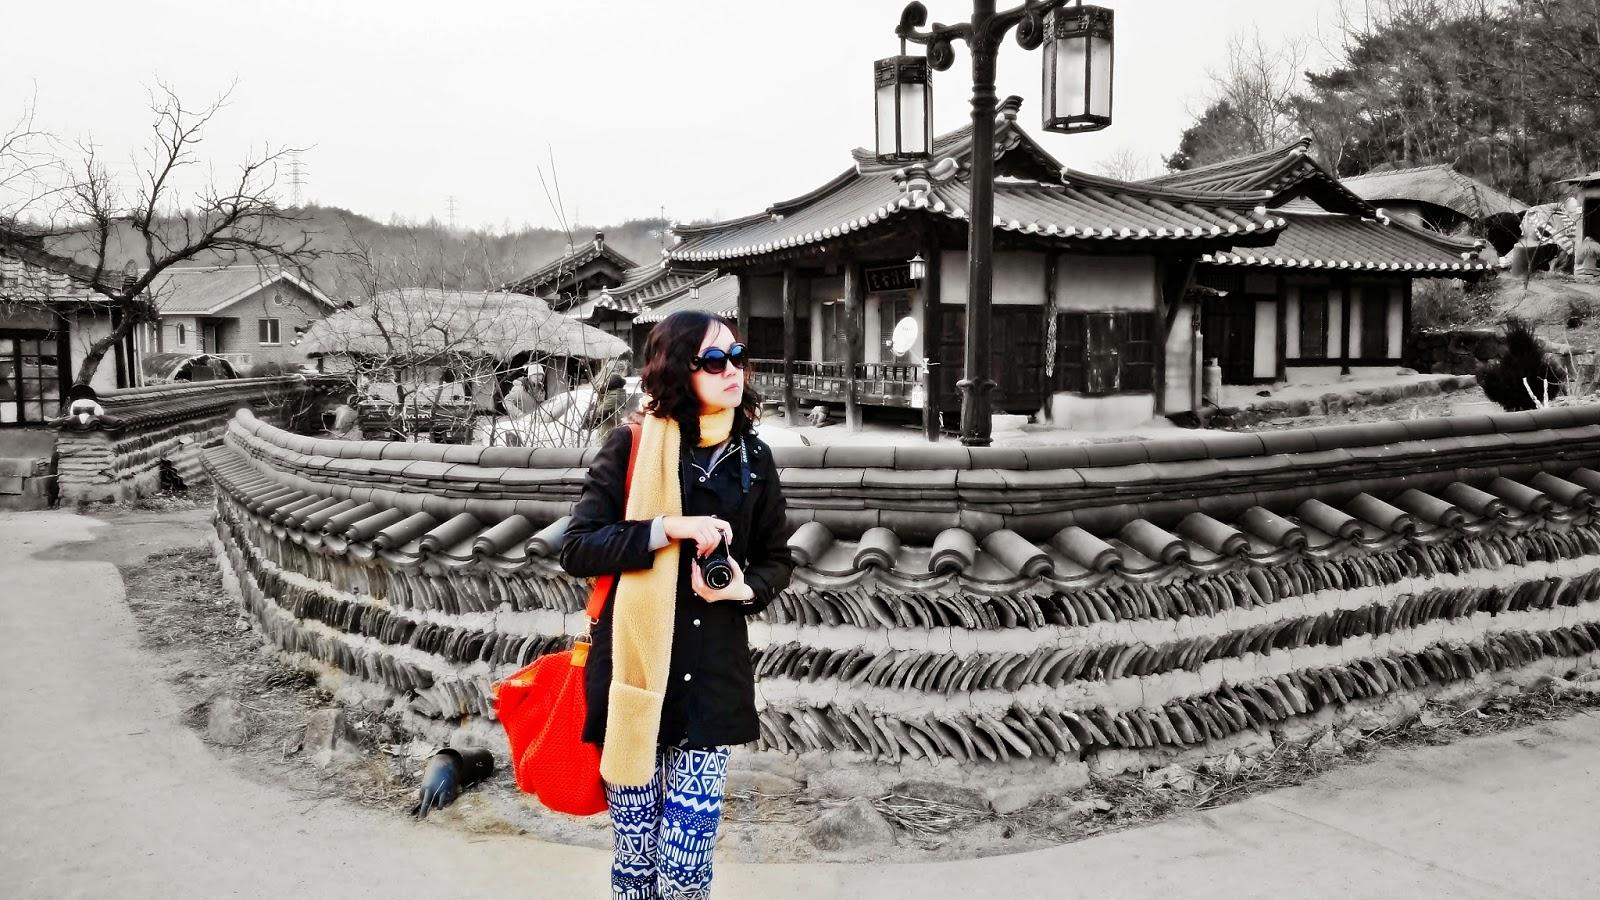 Yeongju Museom Hanok Village 영주 무섬마을 | meheartseoul.blogspot.com